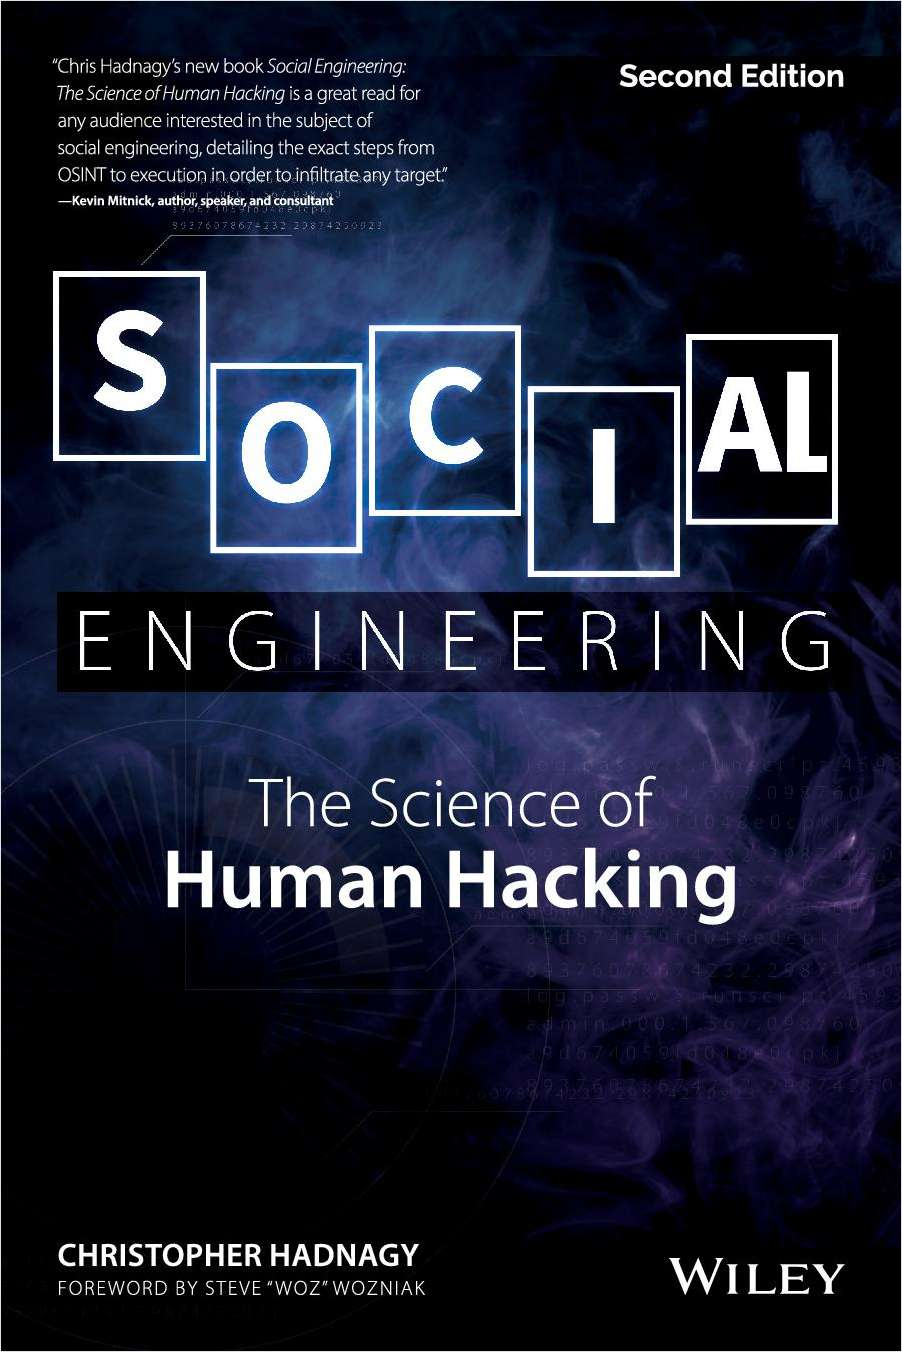 Social Engineering: The Science of Human Hacking (Sampler)